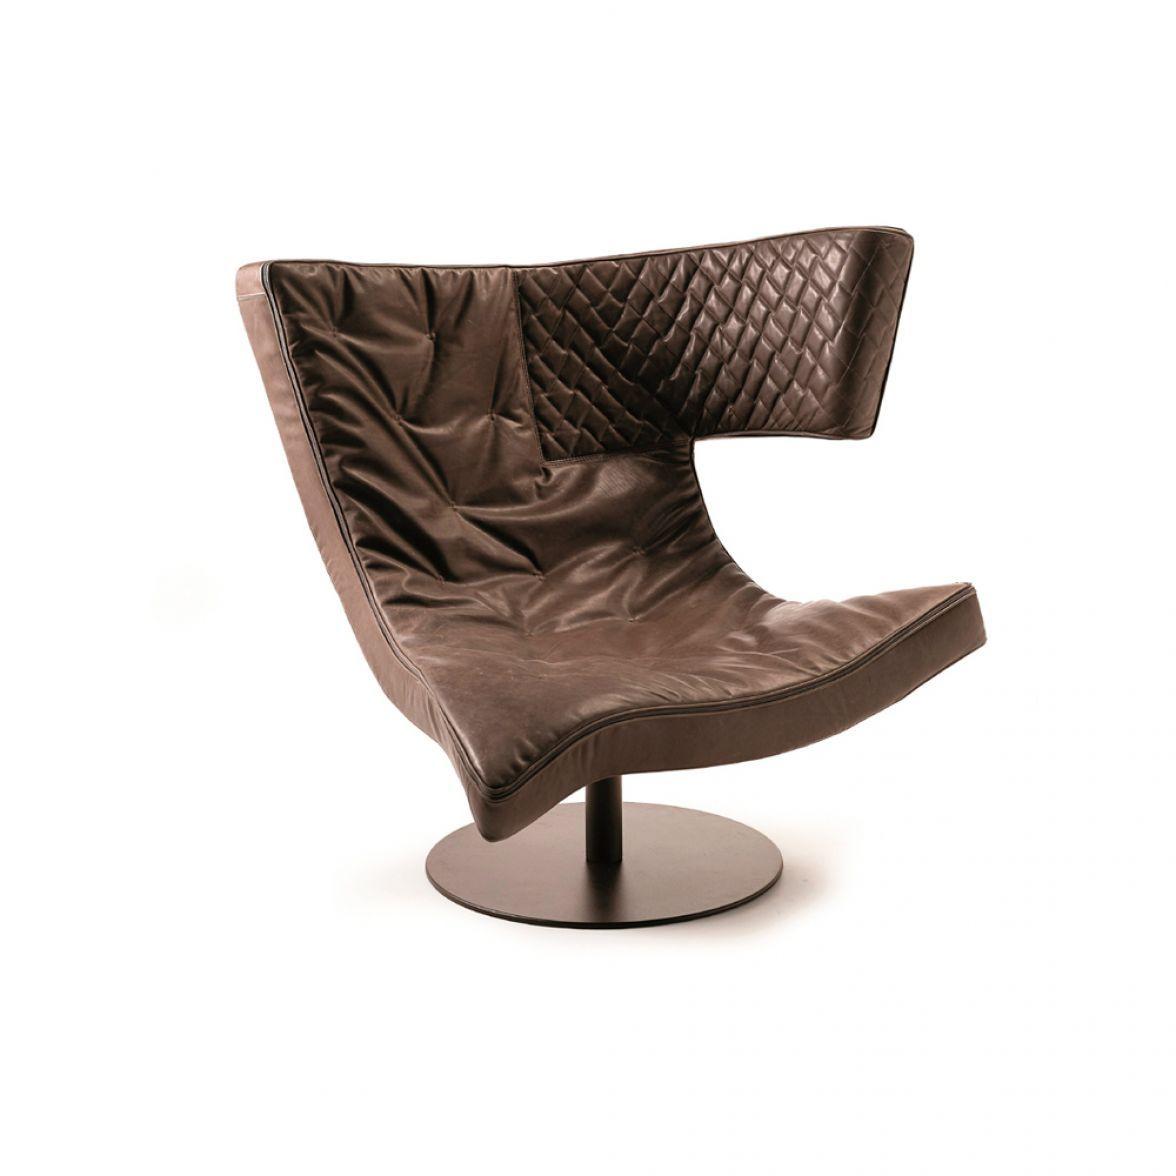 Roxy armchair фото цена